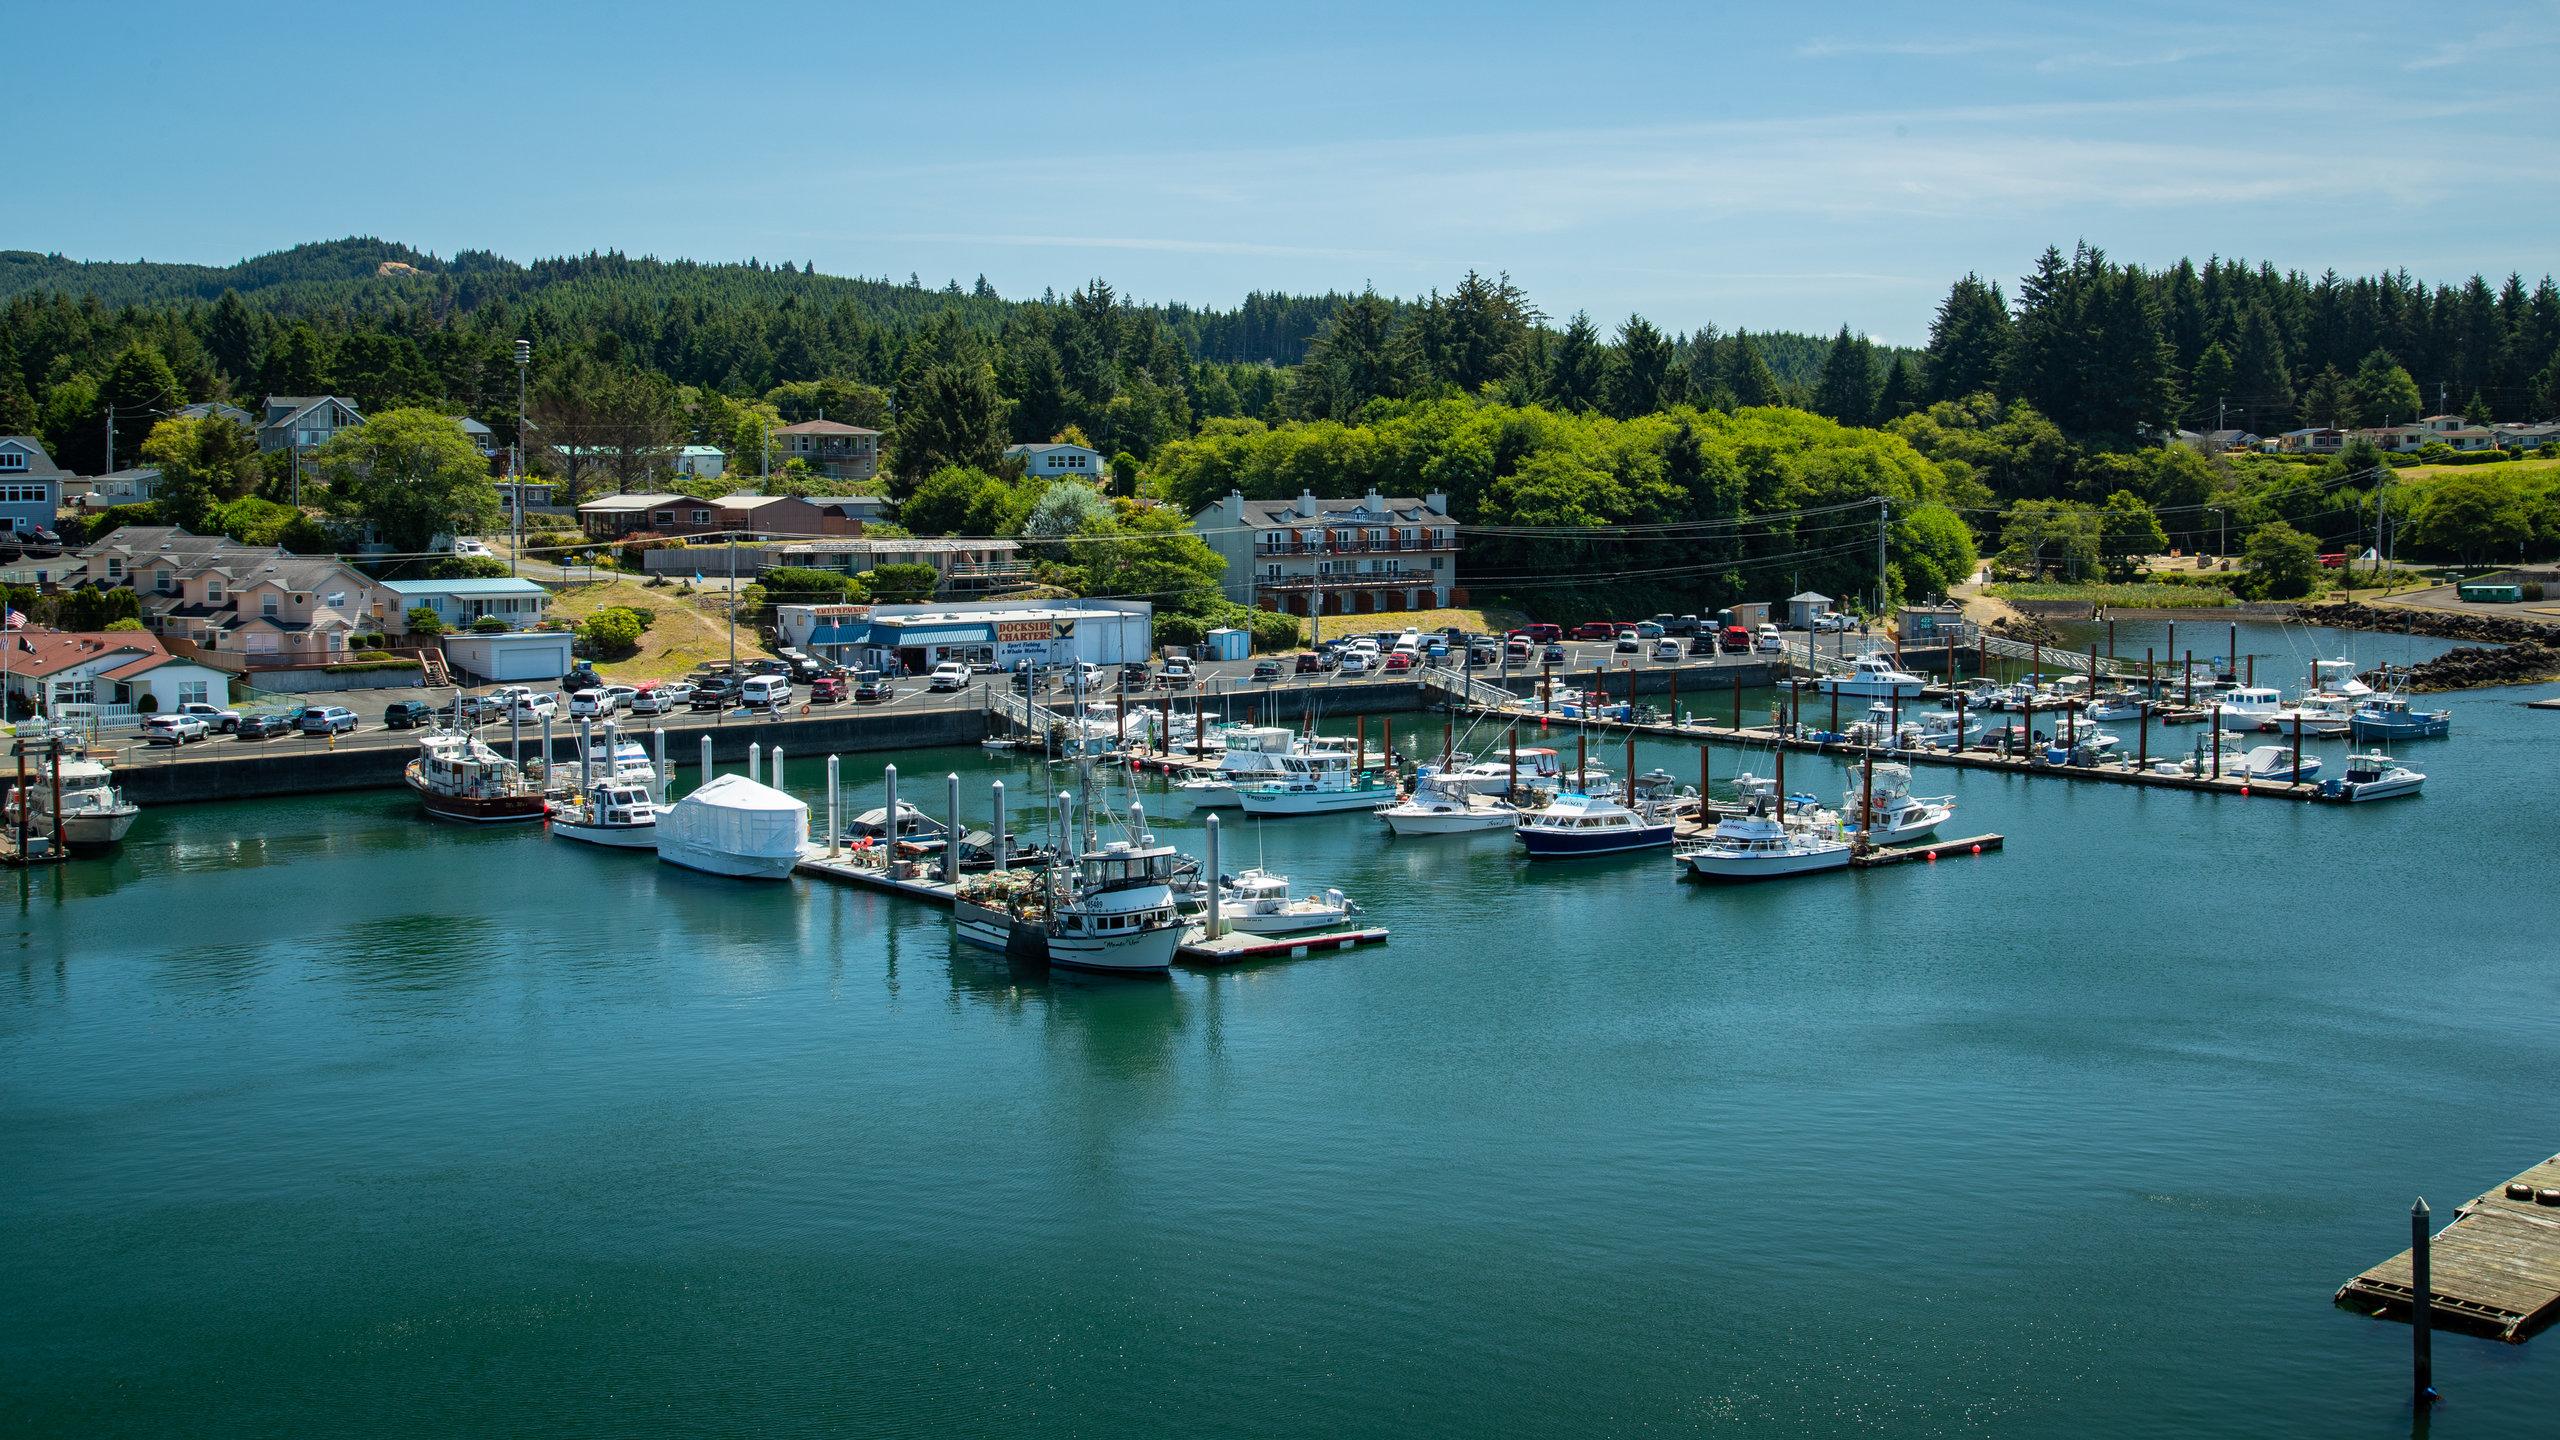 Depoe Bay, Oregon, United States of America